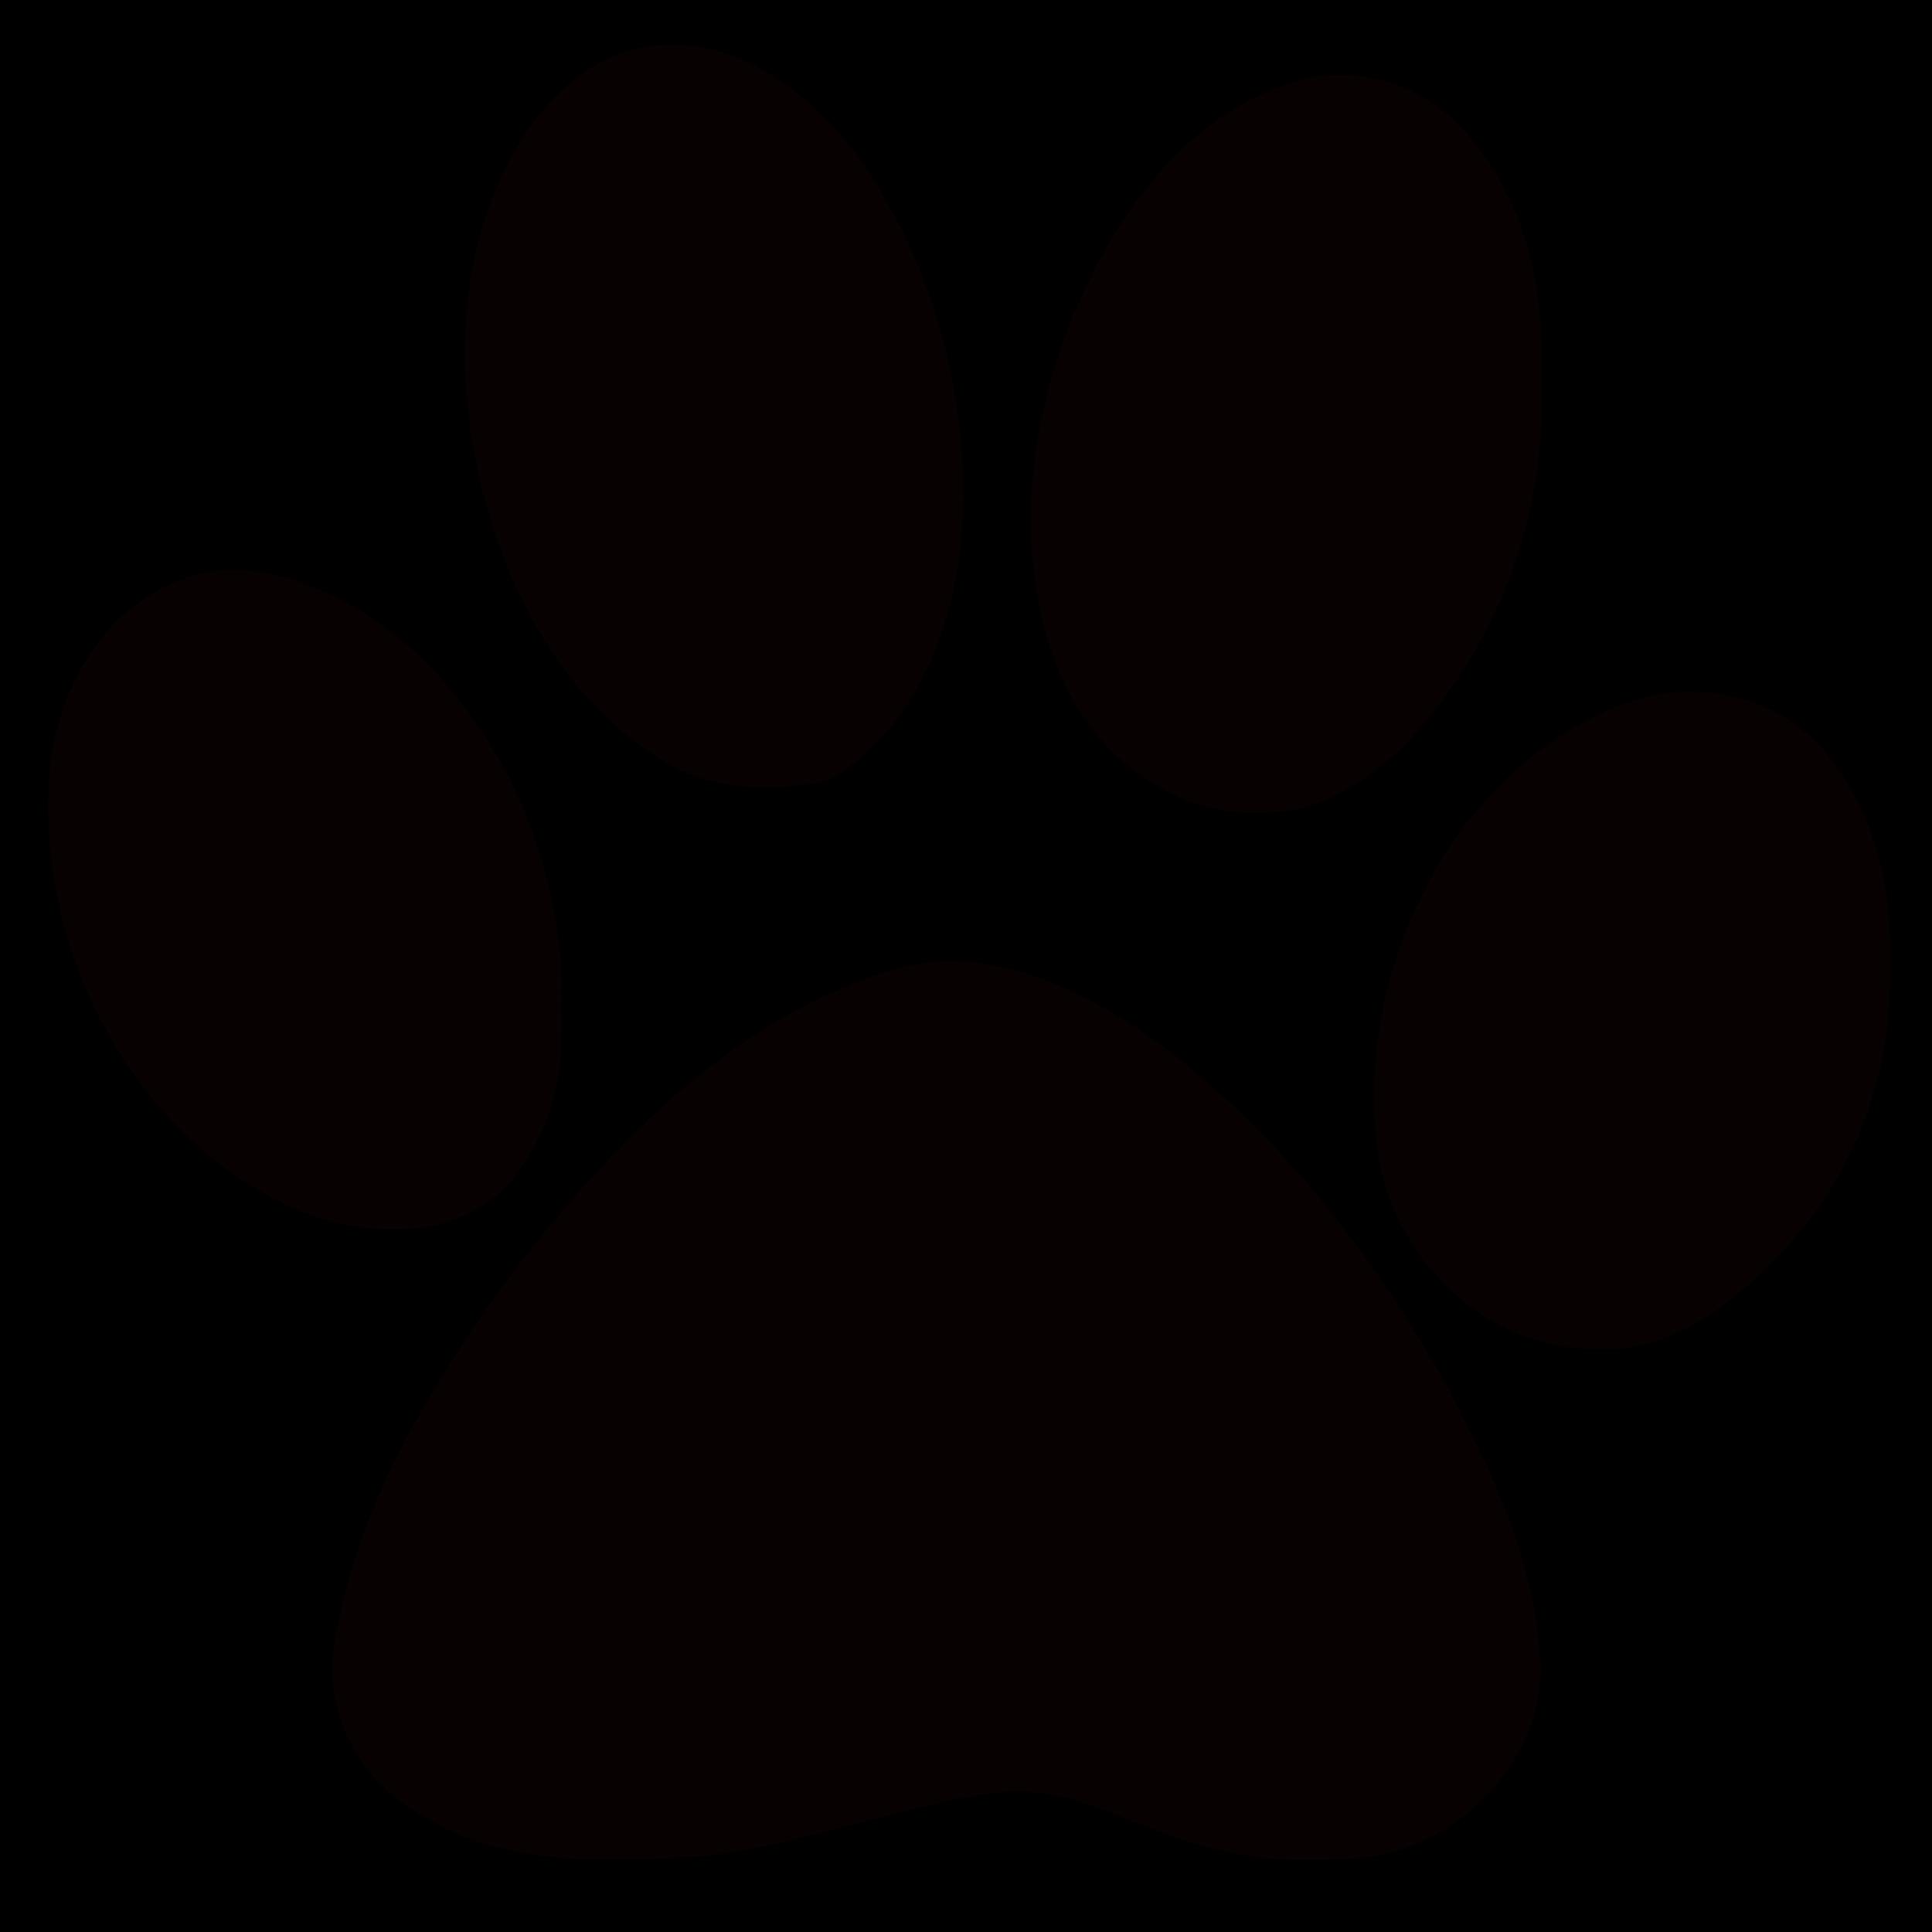 2500x2500 Dog Paw Print Clip Art